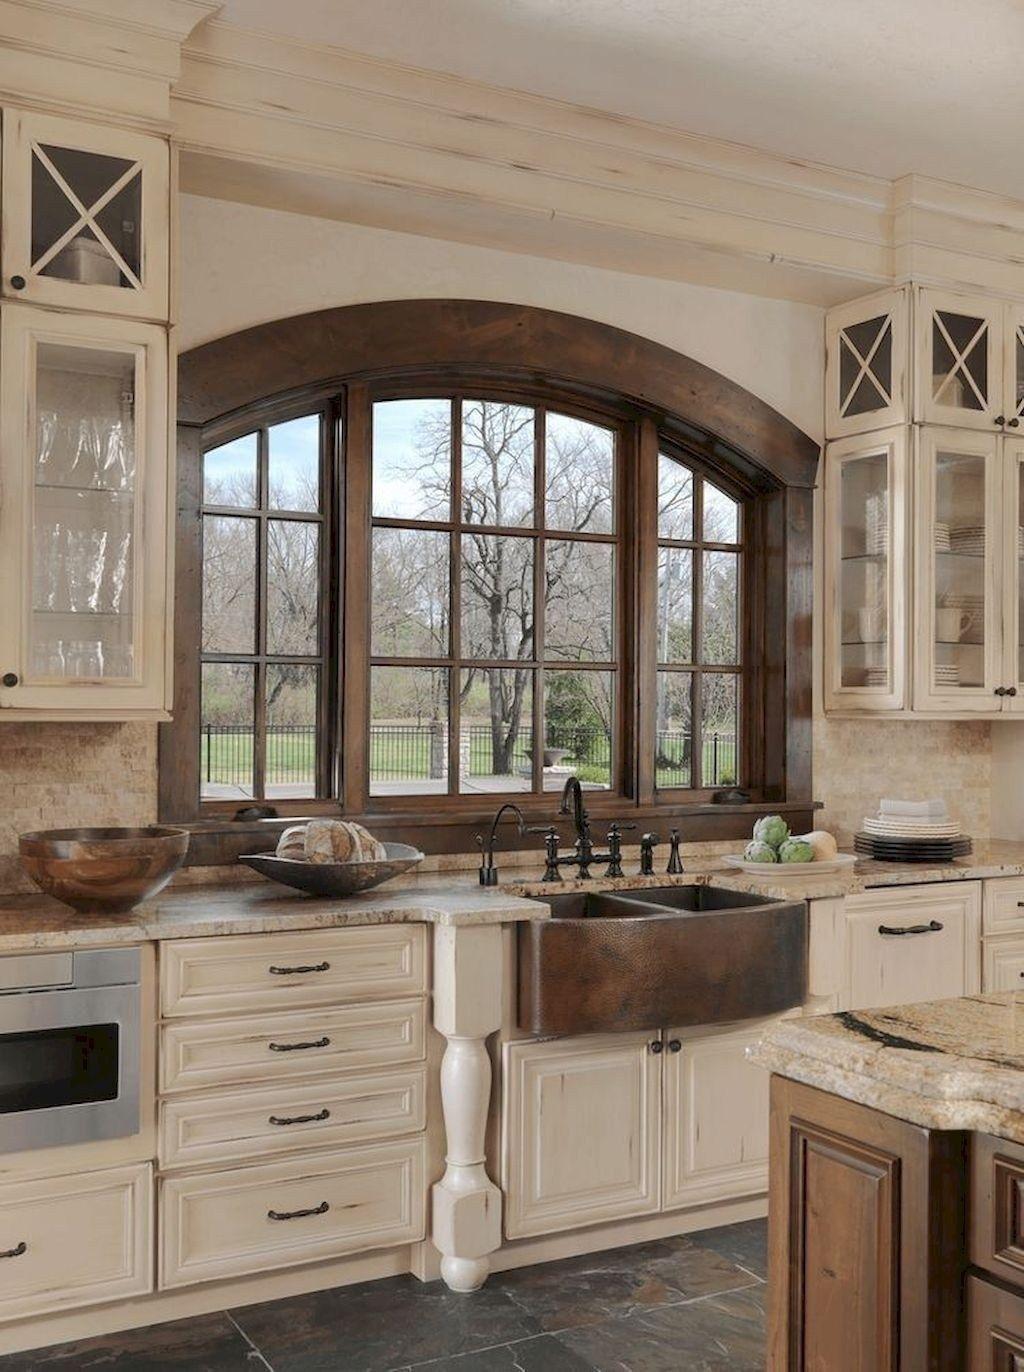 30 Charming Farmhouse Kitchen Cabinets Ideas In 2020 Farmhouse Kitchen Design Farmhouse Style Kitchen Modern Farmhouse Kitchens